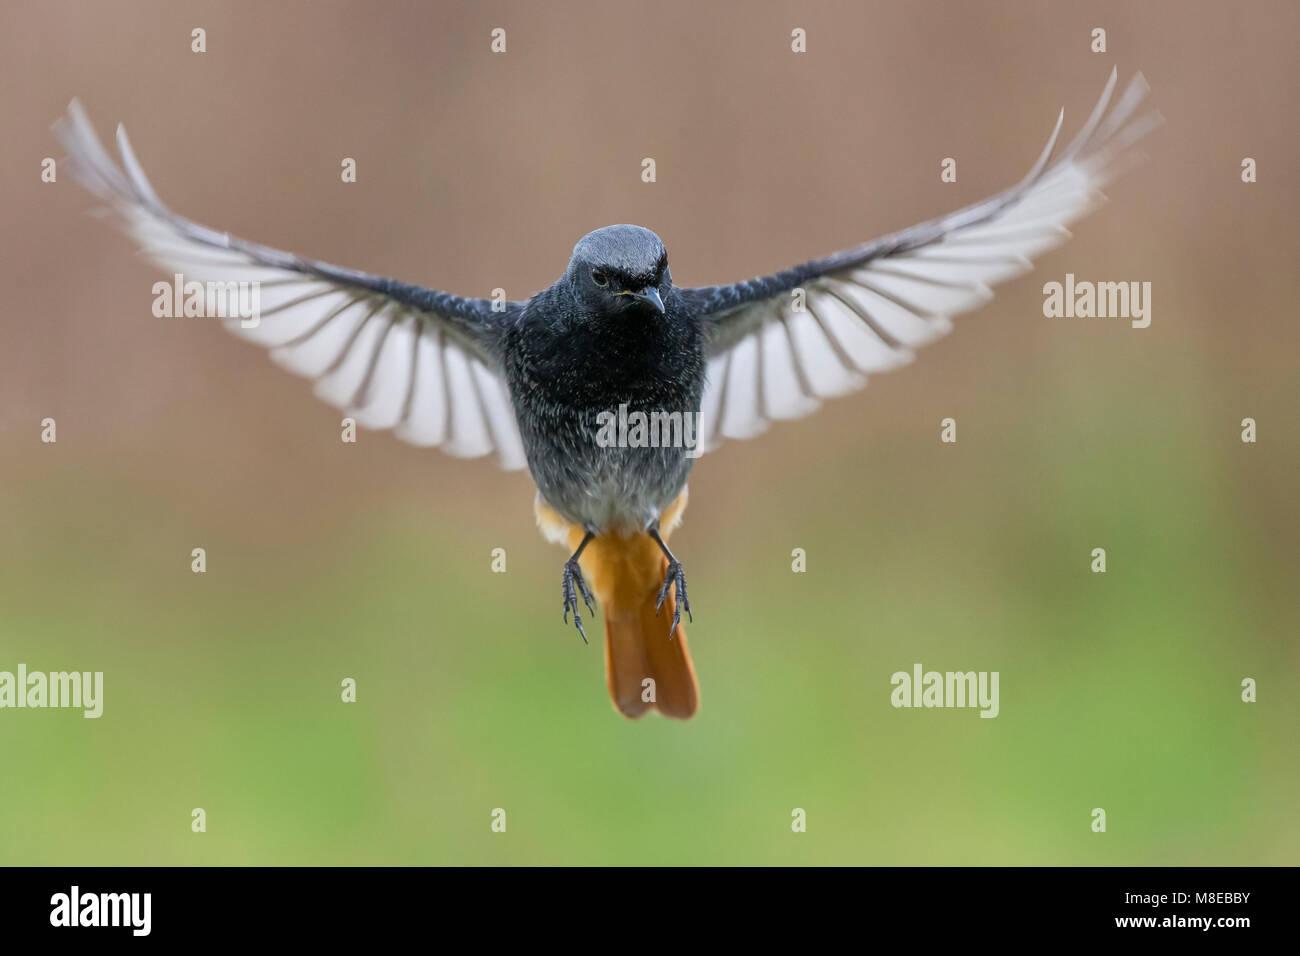 Zwarte Roodstaart; Black Redstart; Phoenicurus ochruros gibraltariensis Stock Photo